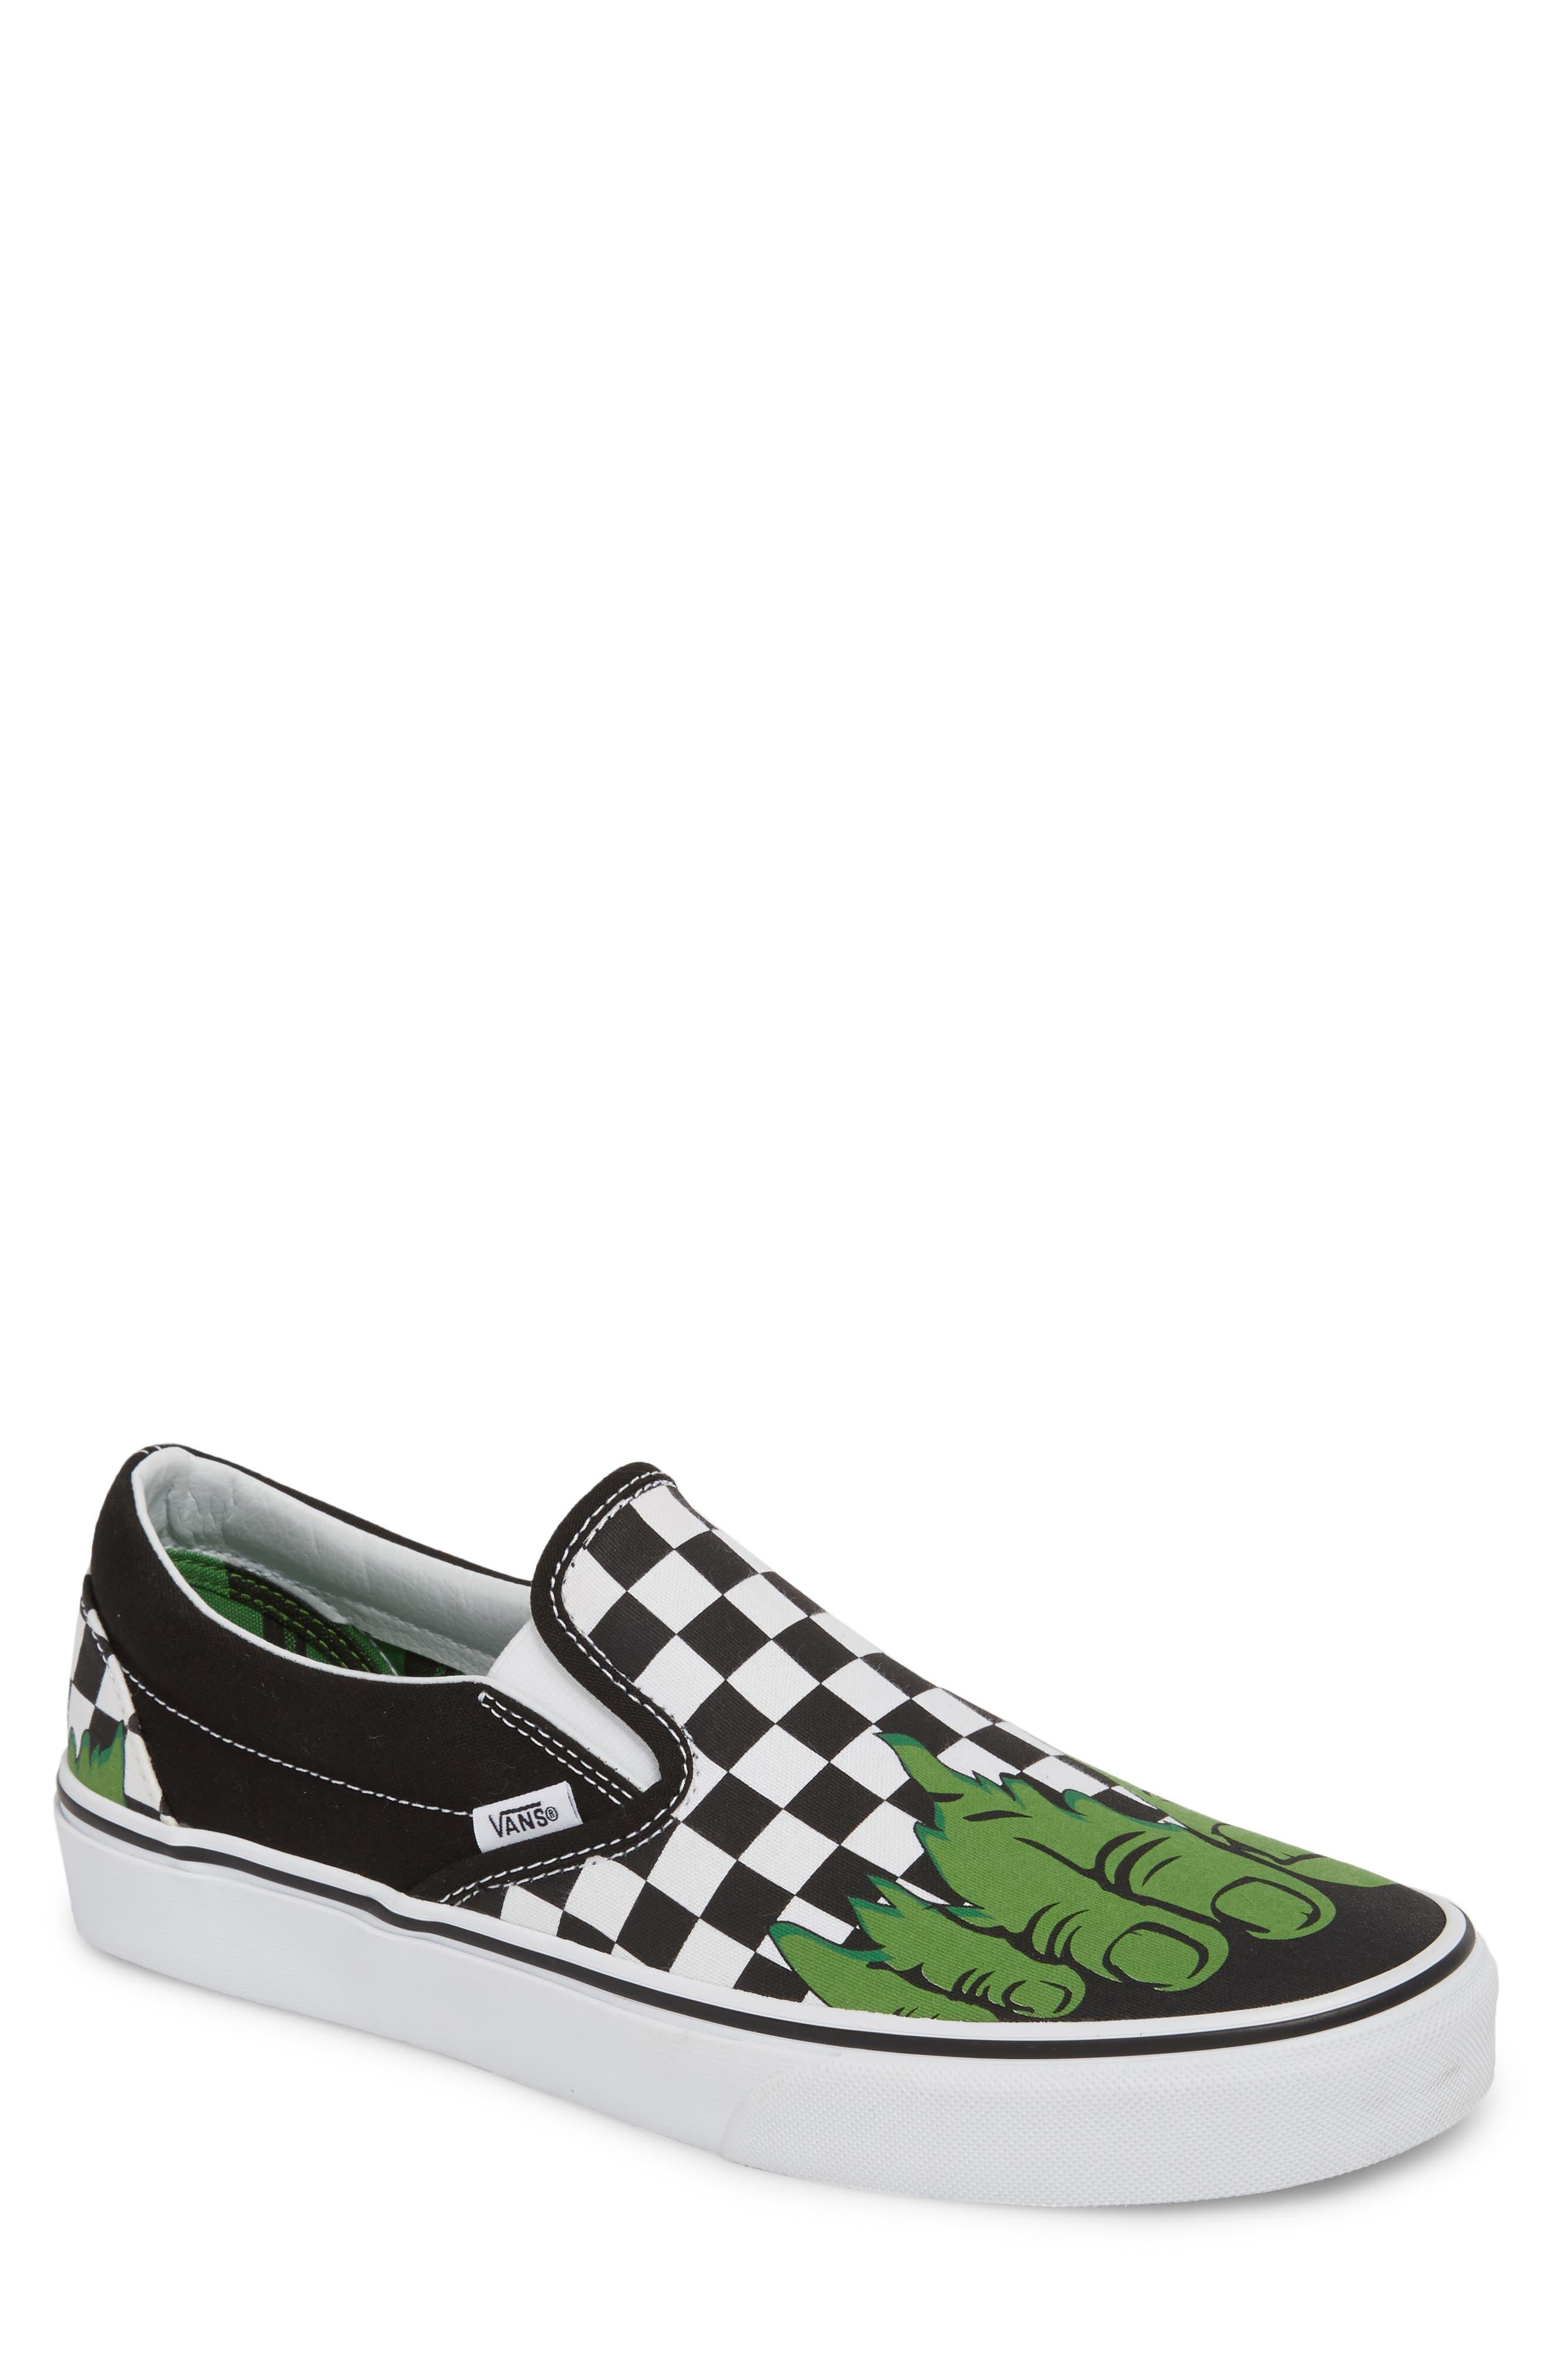 Marvel UA Classic Slip-On Sneaker,                             Main thumbnail 1, color,                             Checkerboard Textile